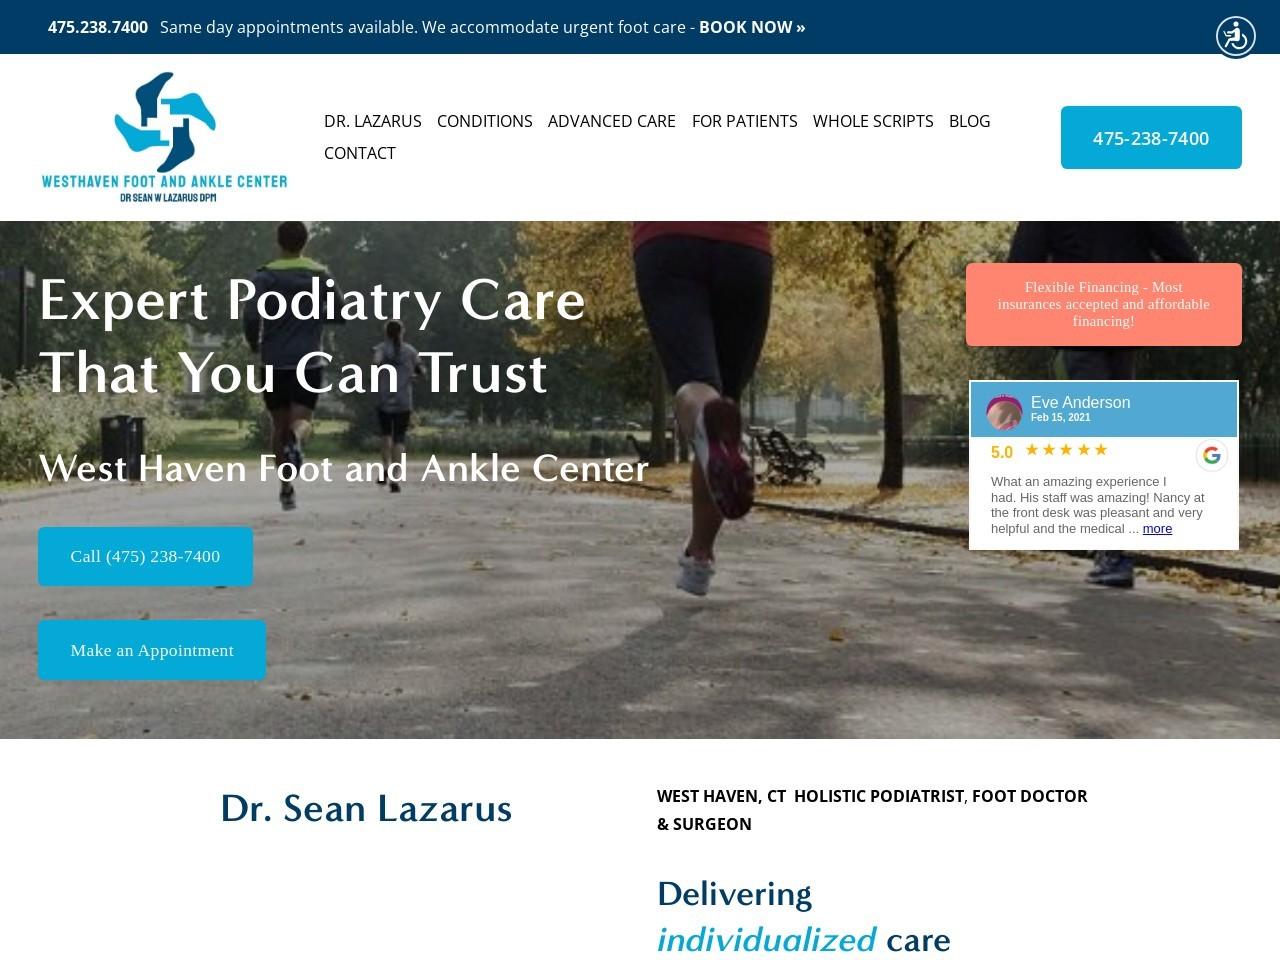 screenshot of Florida Surgical Specialists website